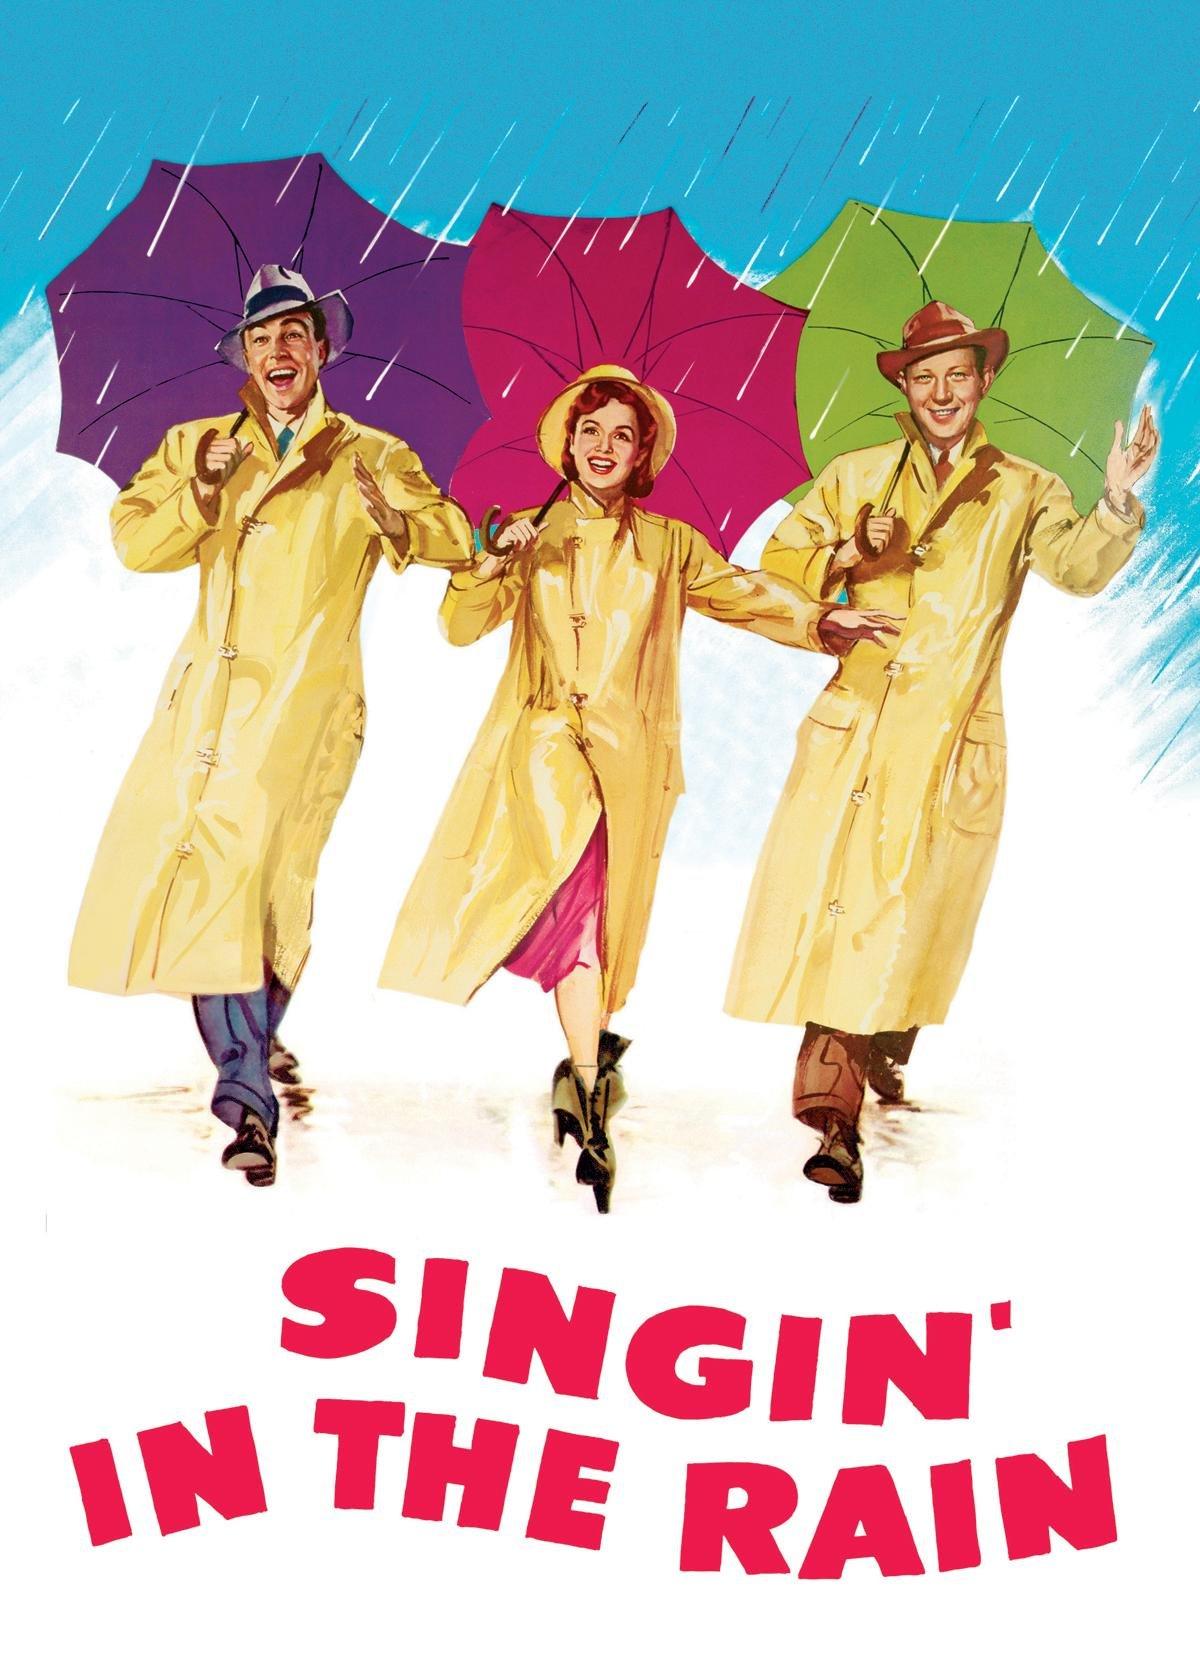 Singin' in the Rain by